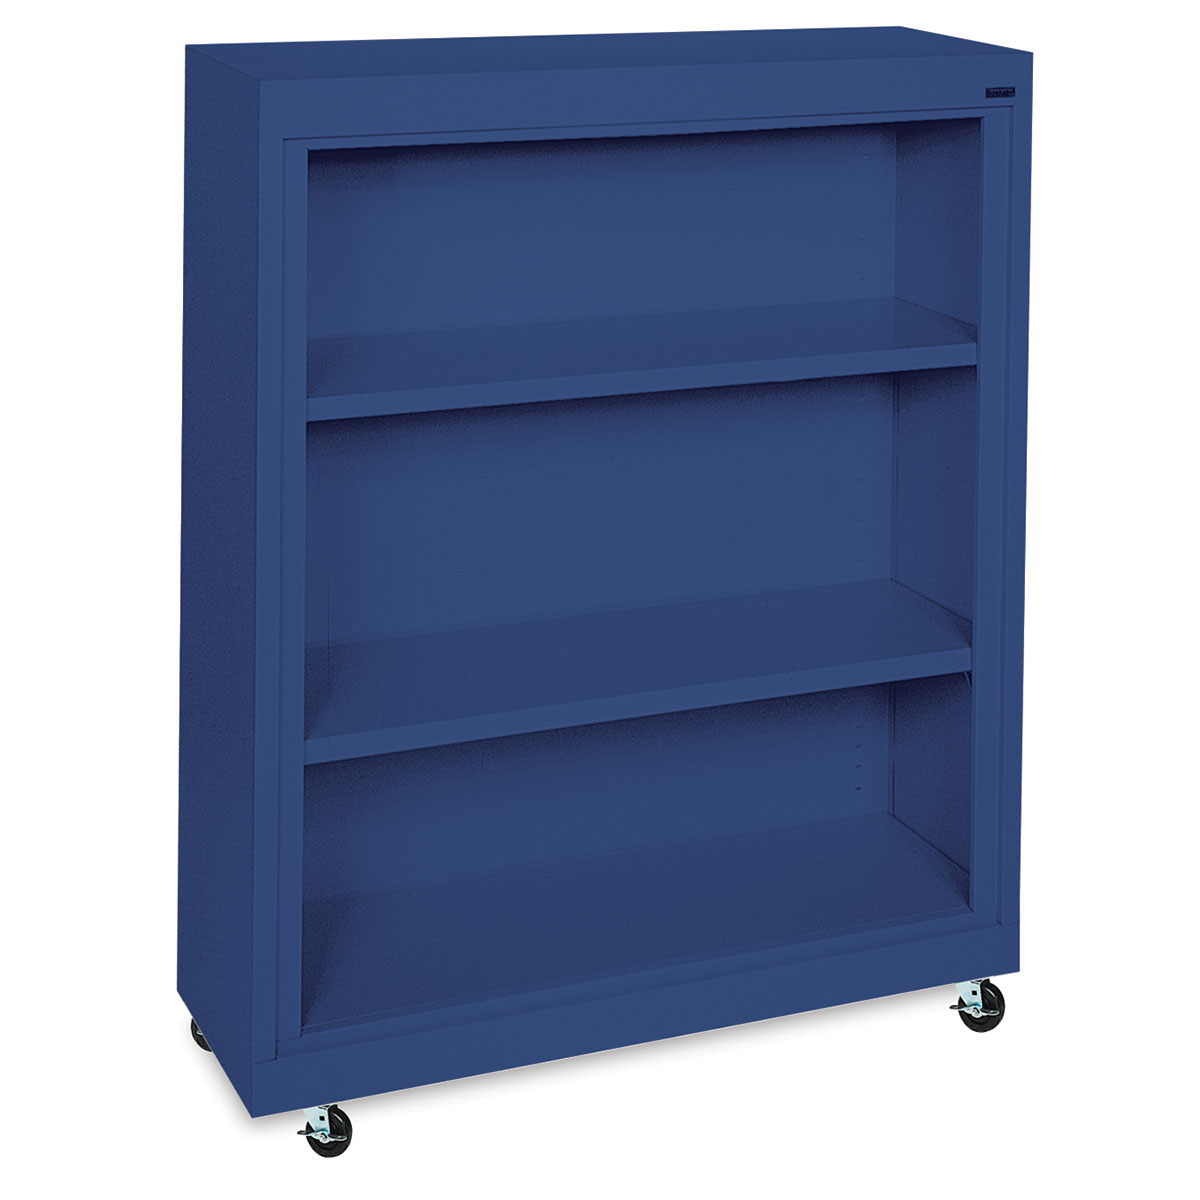 Sandusky Lee Mobile Bookcase - 36 x 48 x 18, Blue